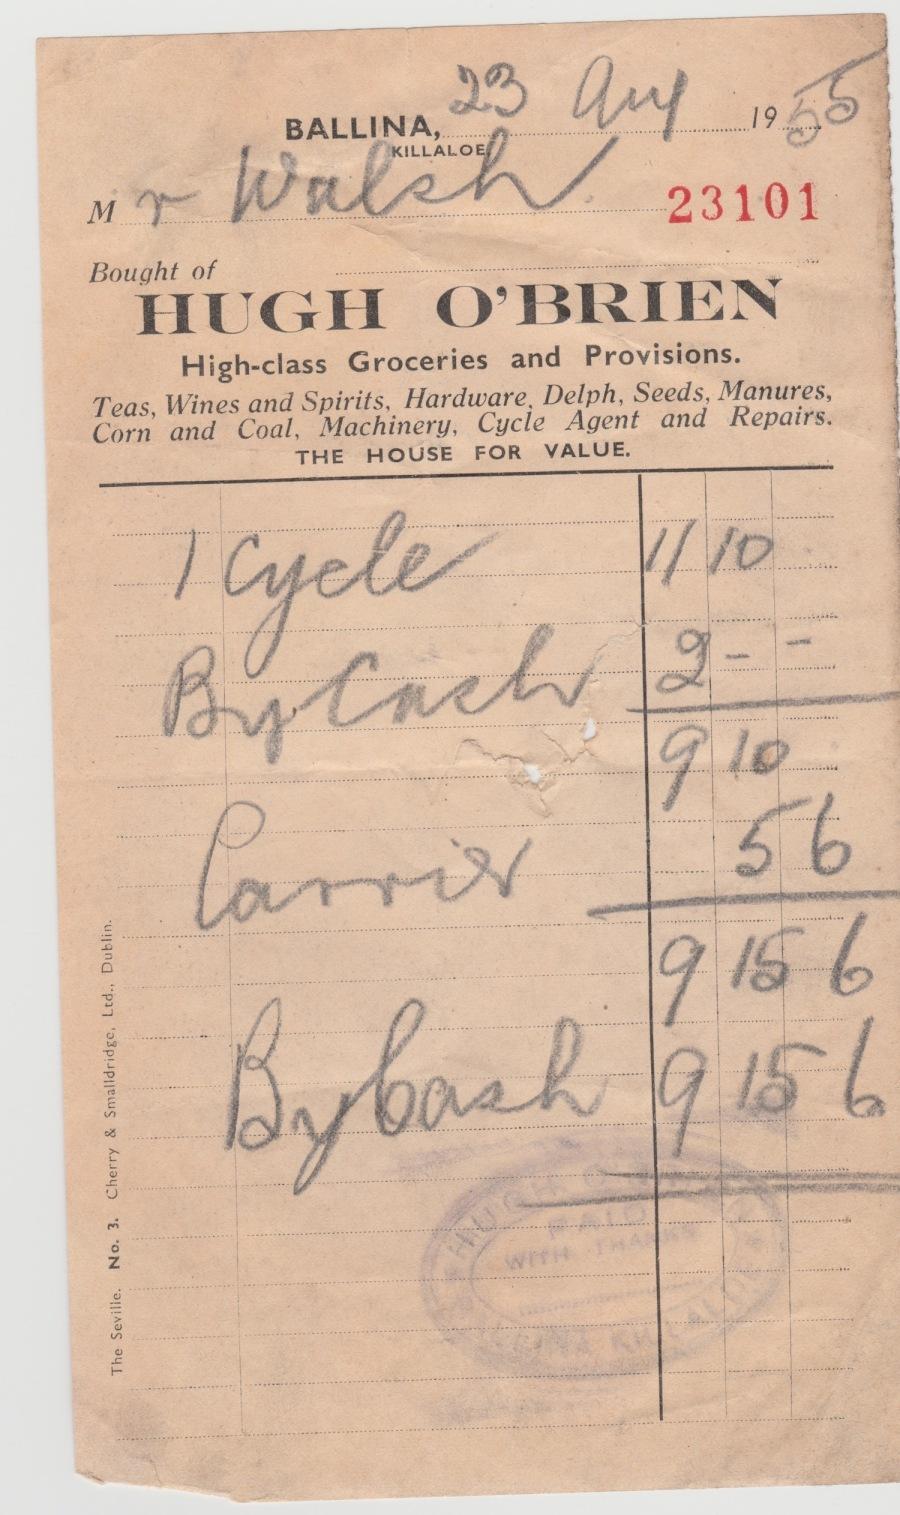 OBriens Ballina Receipt 1955